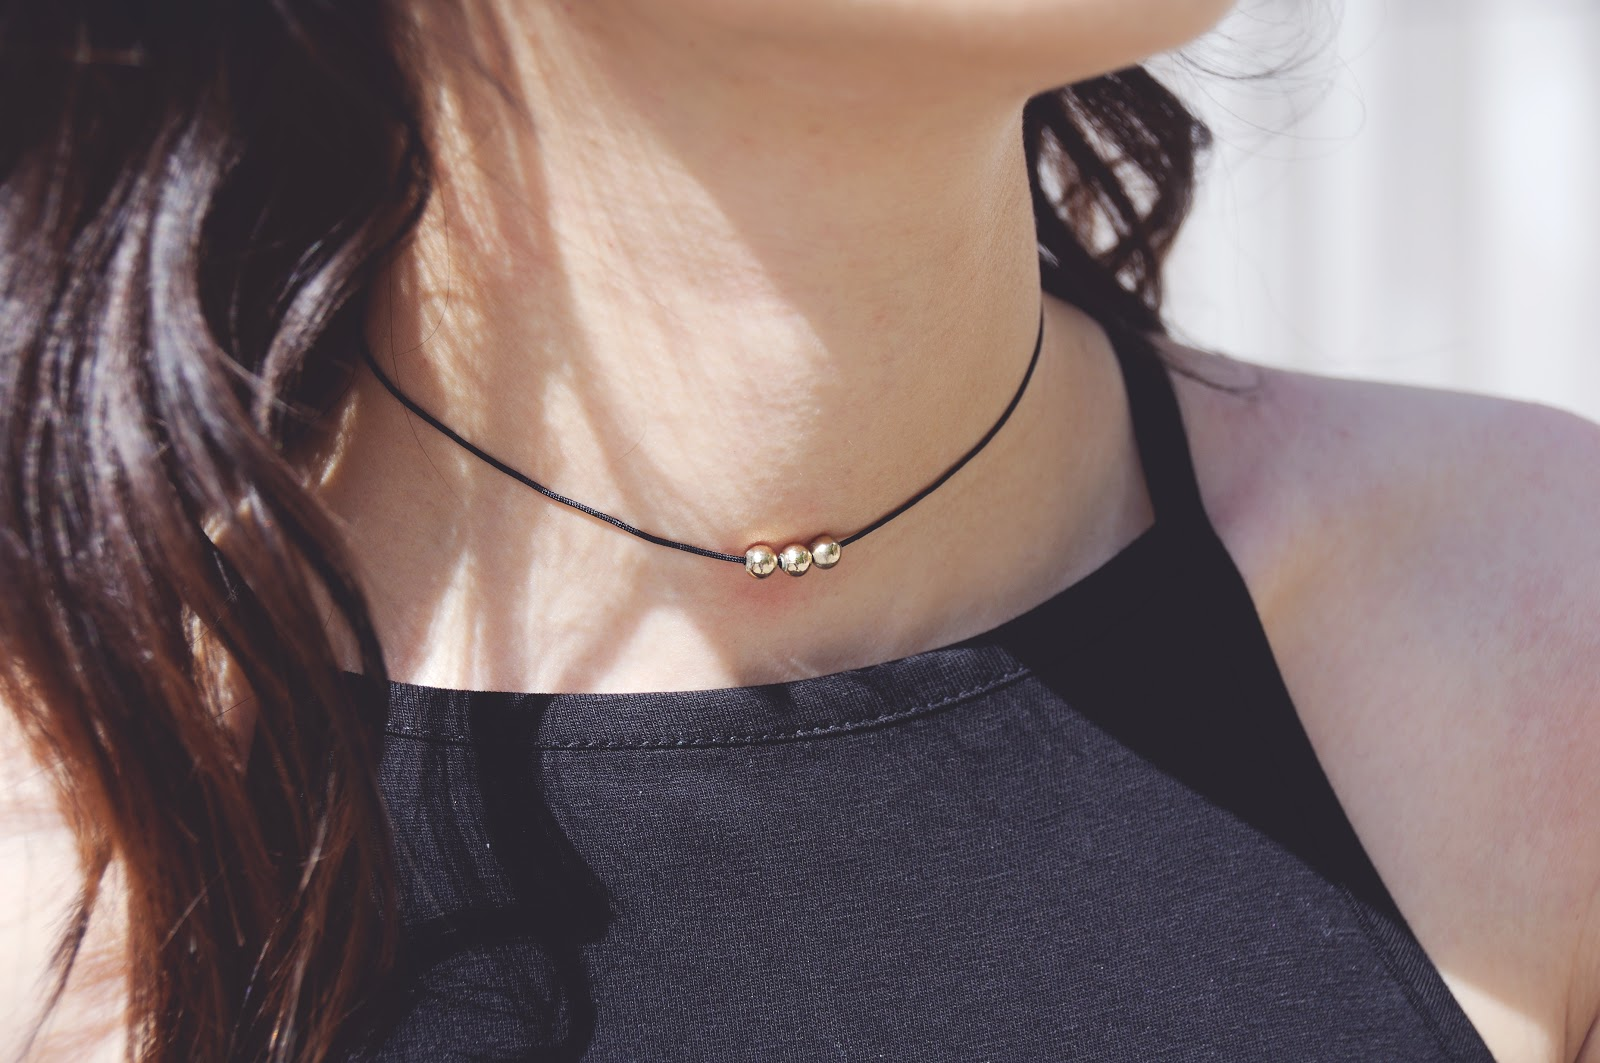 90s choker necklace